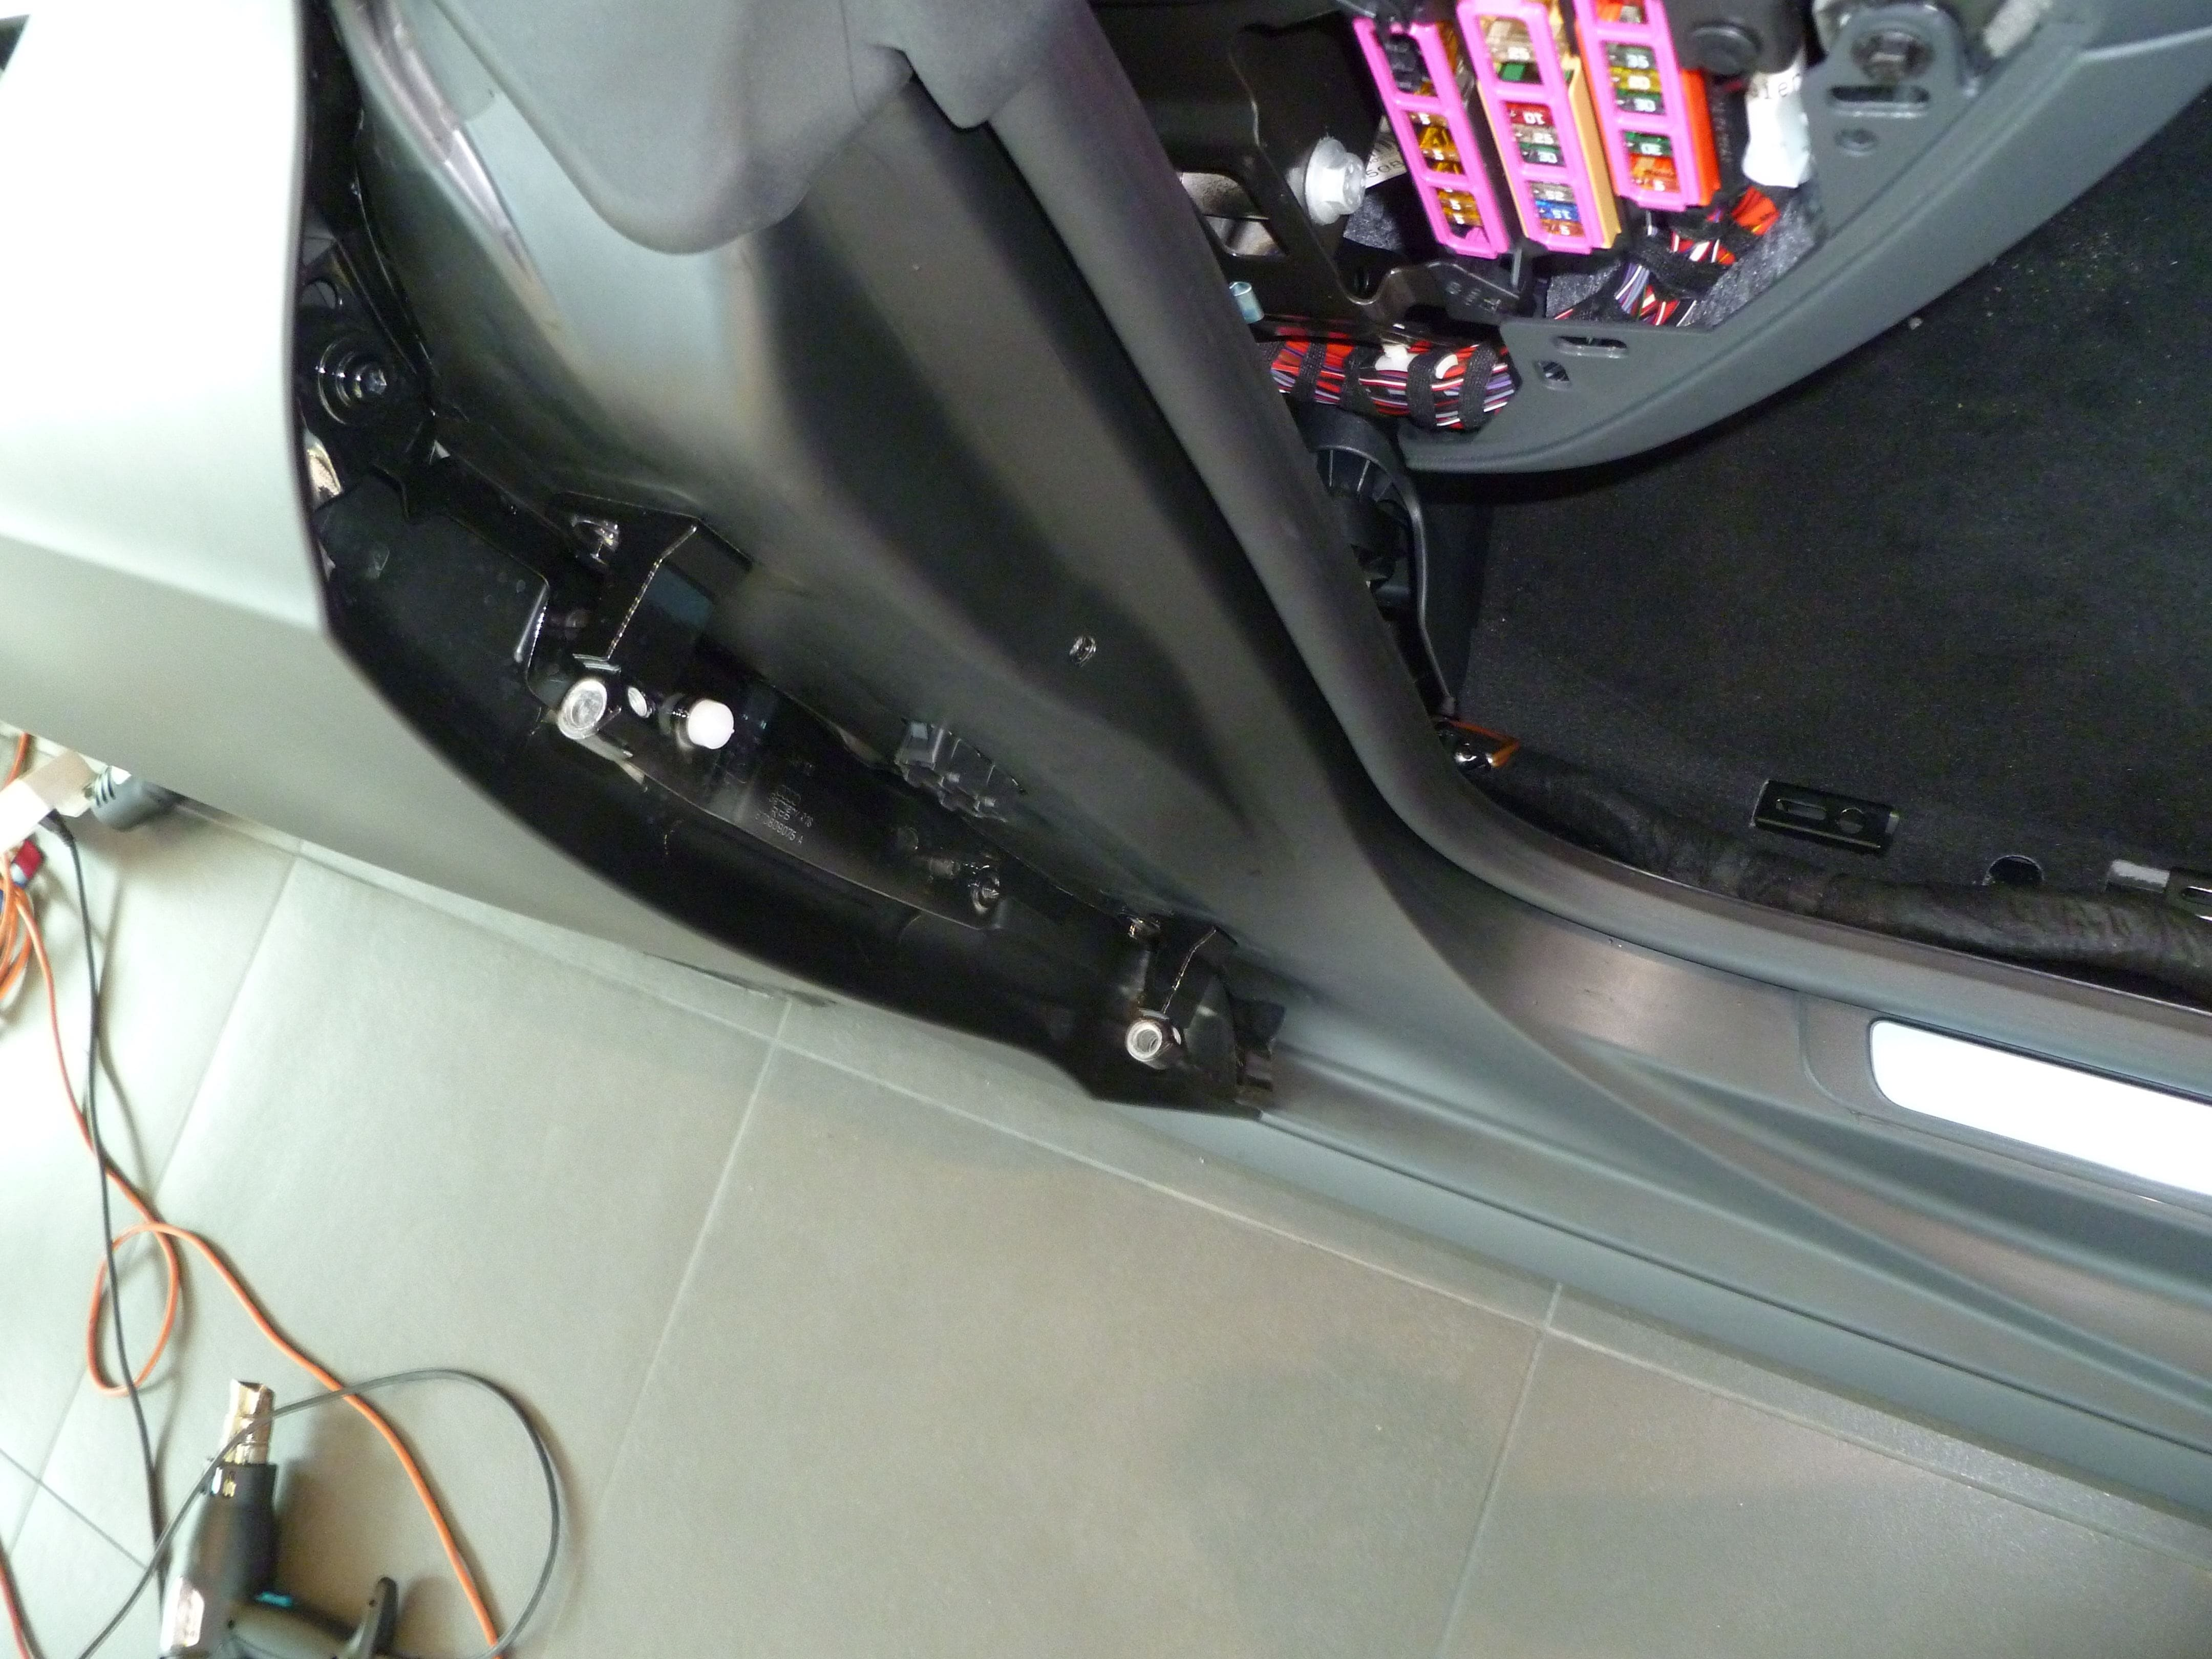 Audi A5 Coupe met Mat Zwarte Wrap, Carwrapping door Wrapmyride.nu Foto-nr:4643, ©2021